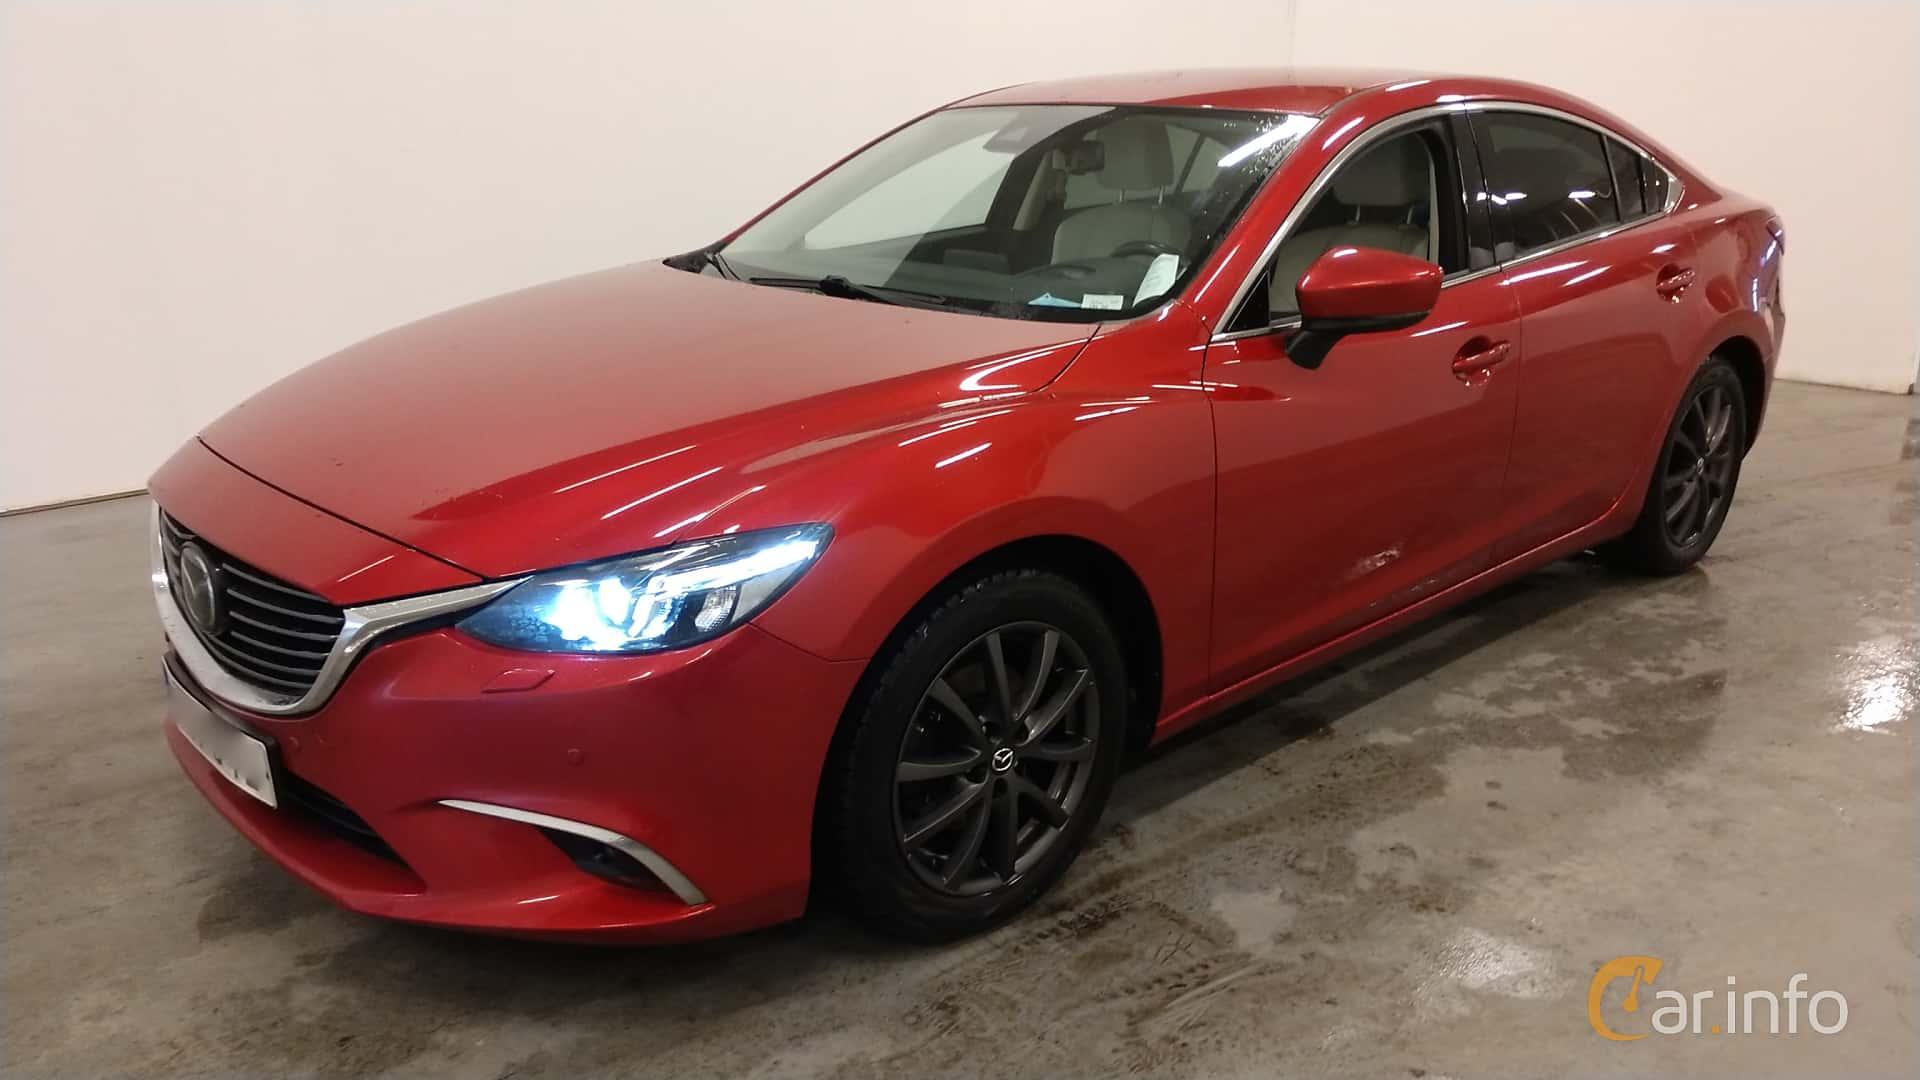 Front/Side  of Mazda 6 Sedan 2.5 SKYACTIV-G Automatic, 192ps, 2017